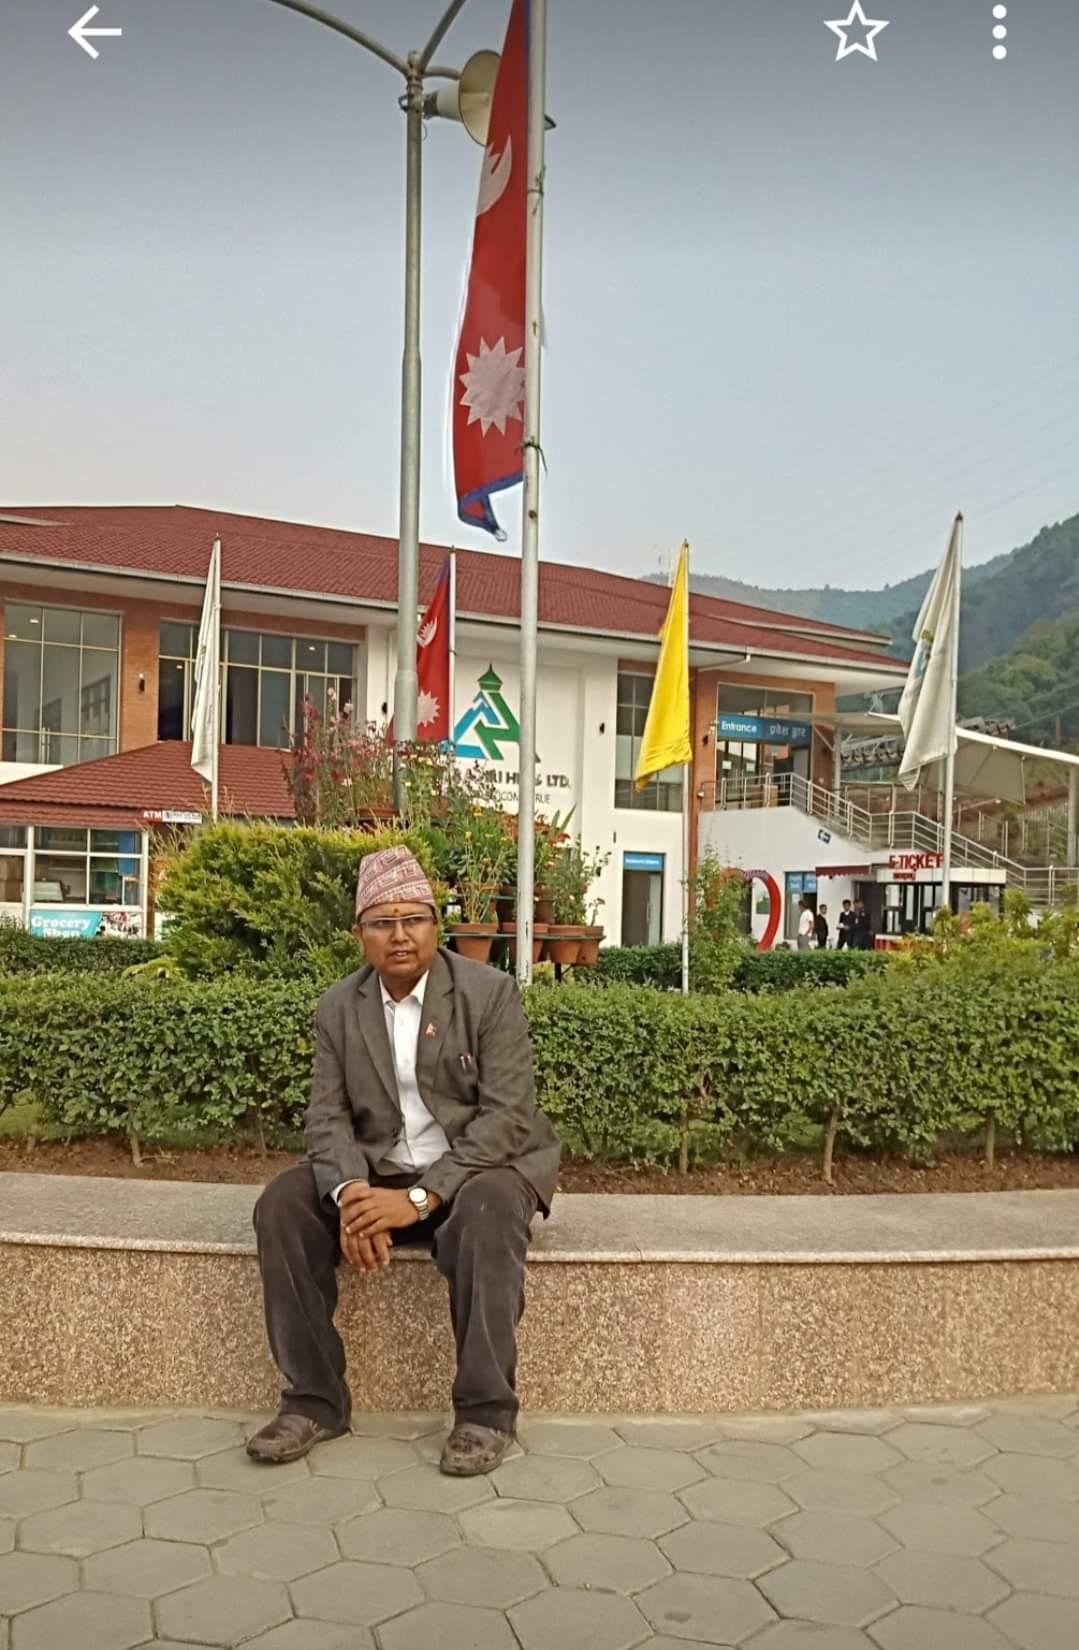 Datta Prasad Acharya is the president of the children's organization